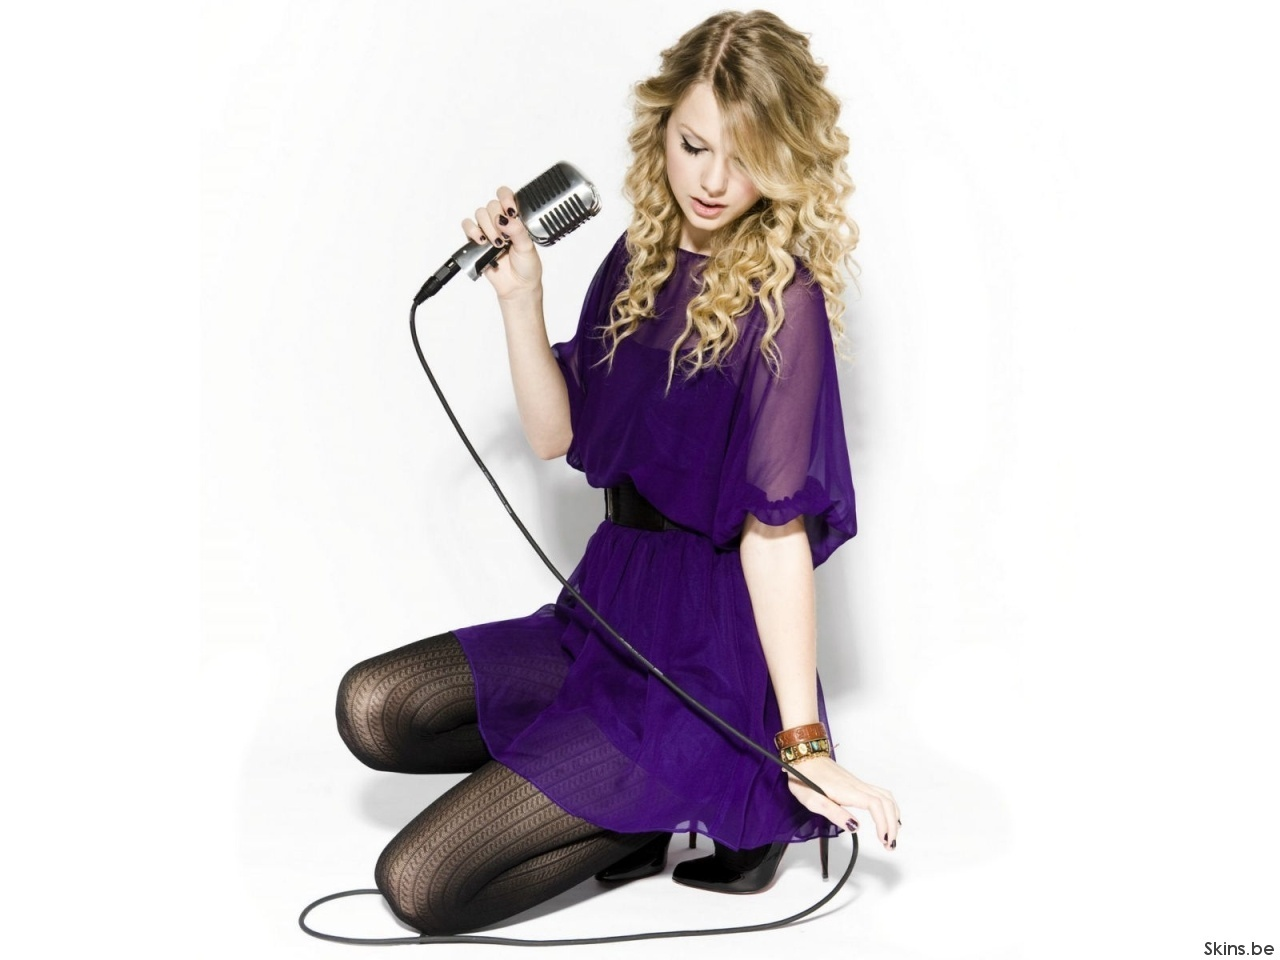 http://images2.fanpop.com/images/photos/4700000/Taylor-Swift-taylor-swift-4771696-1280-960.jpg